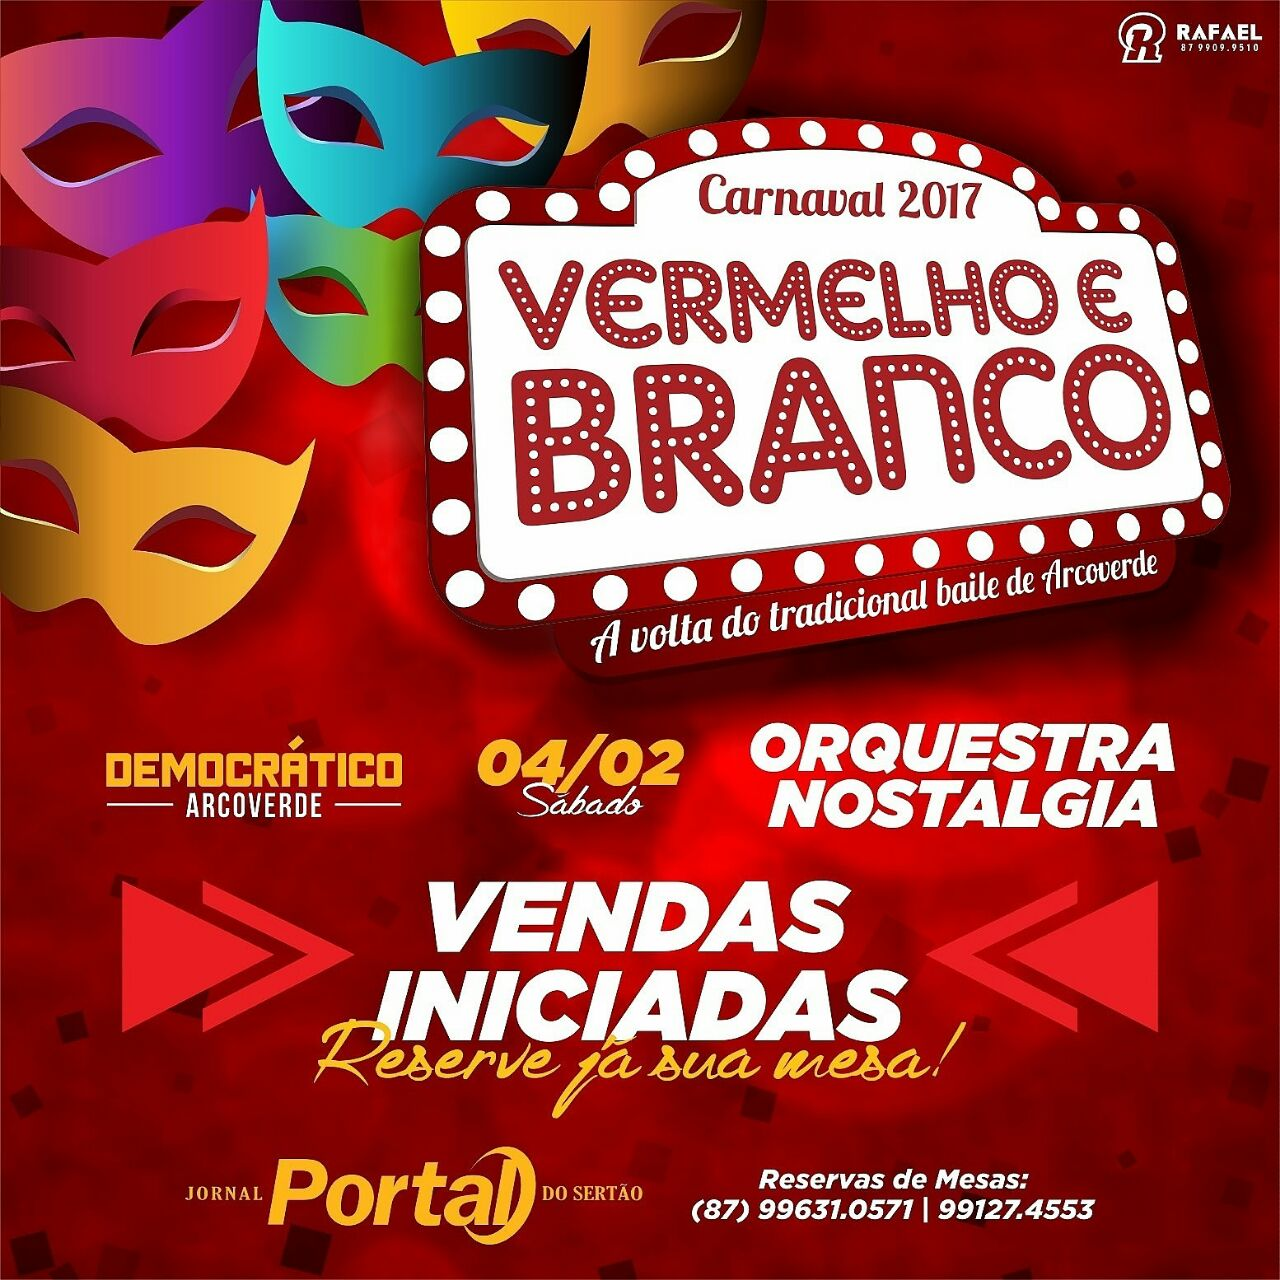 Carnaval 2017 em Arcoverde